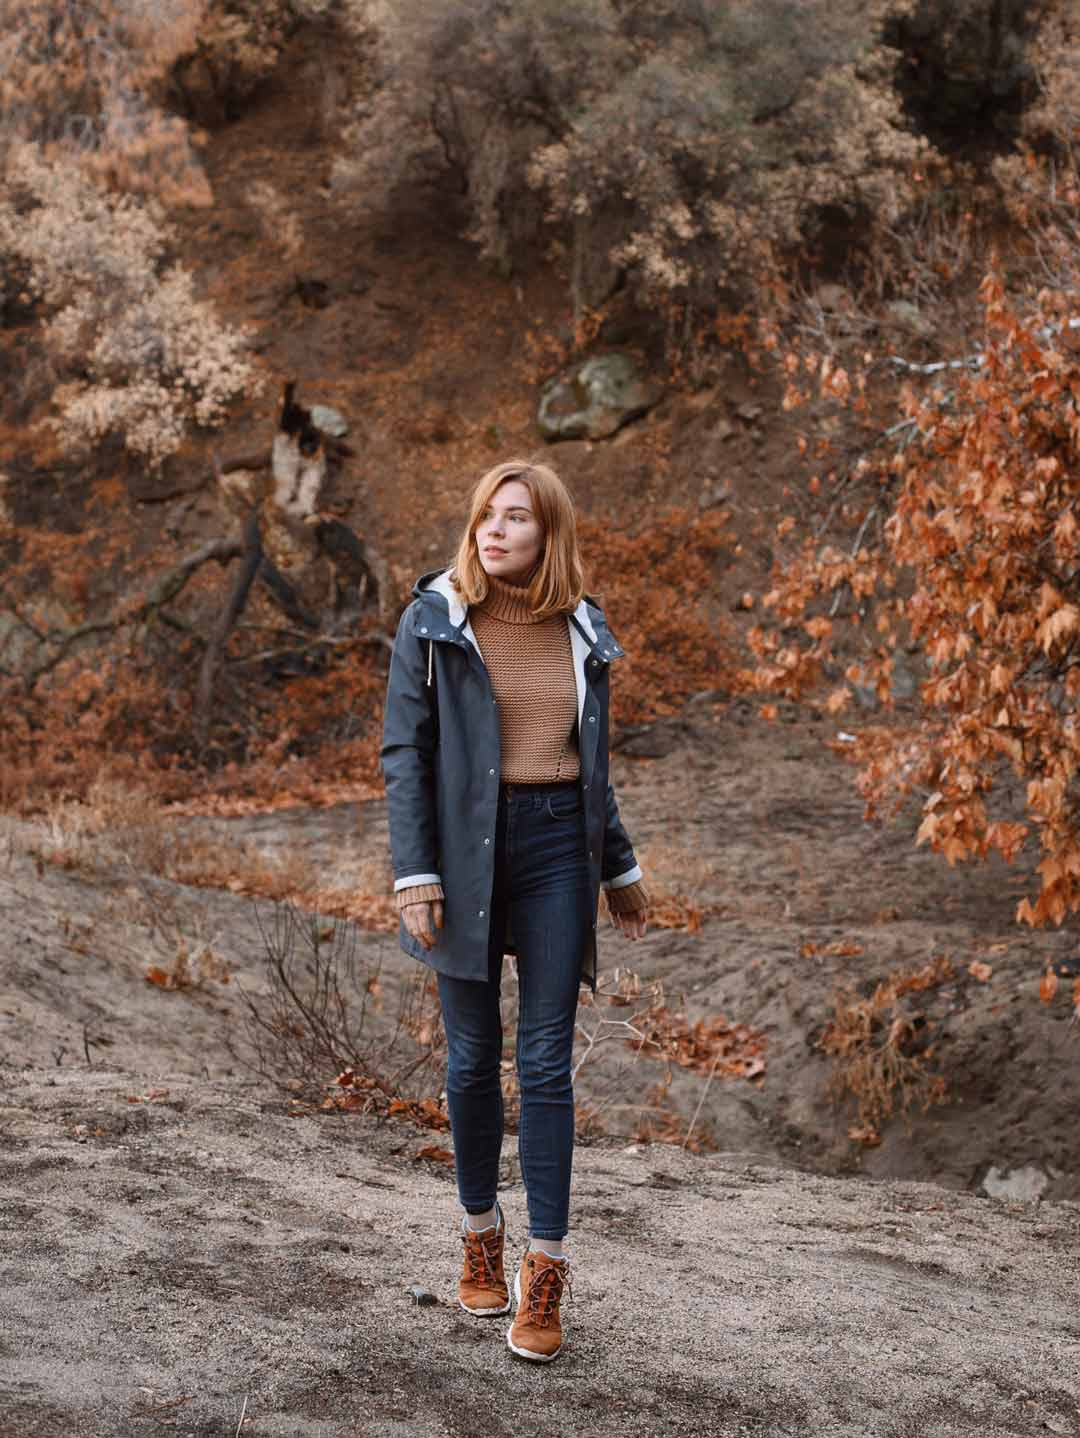 Courtney Halverson walks in the woods wearing the Women's Arrowood Lux Mid sneakerboots.